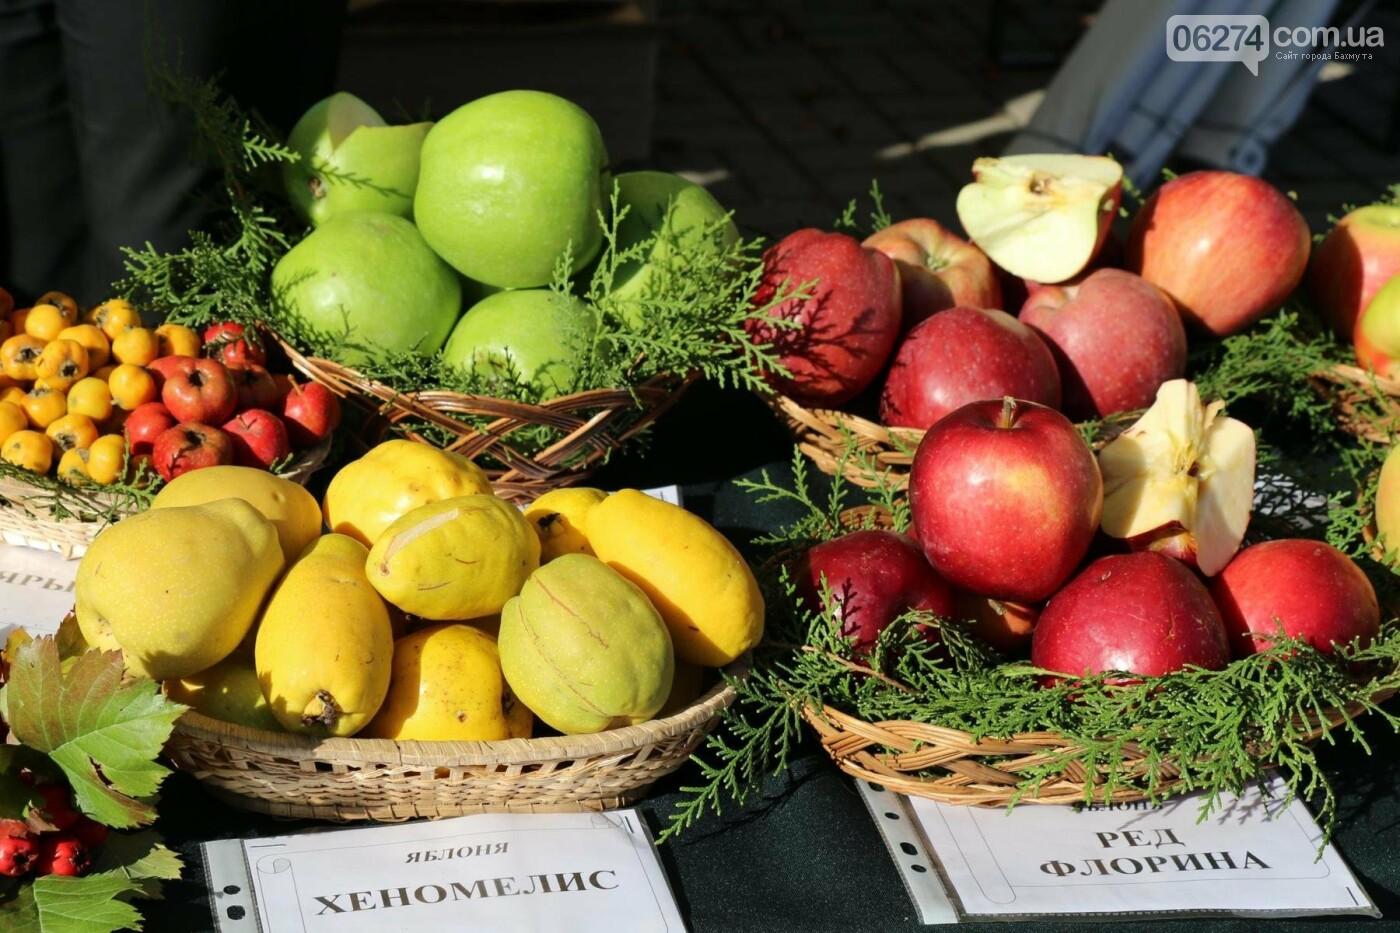 В Бахмуте прошла ярмарка «День садовода» (ФОТО), фото-14